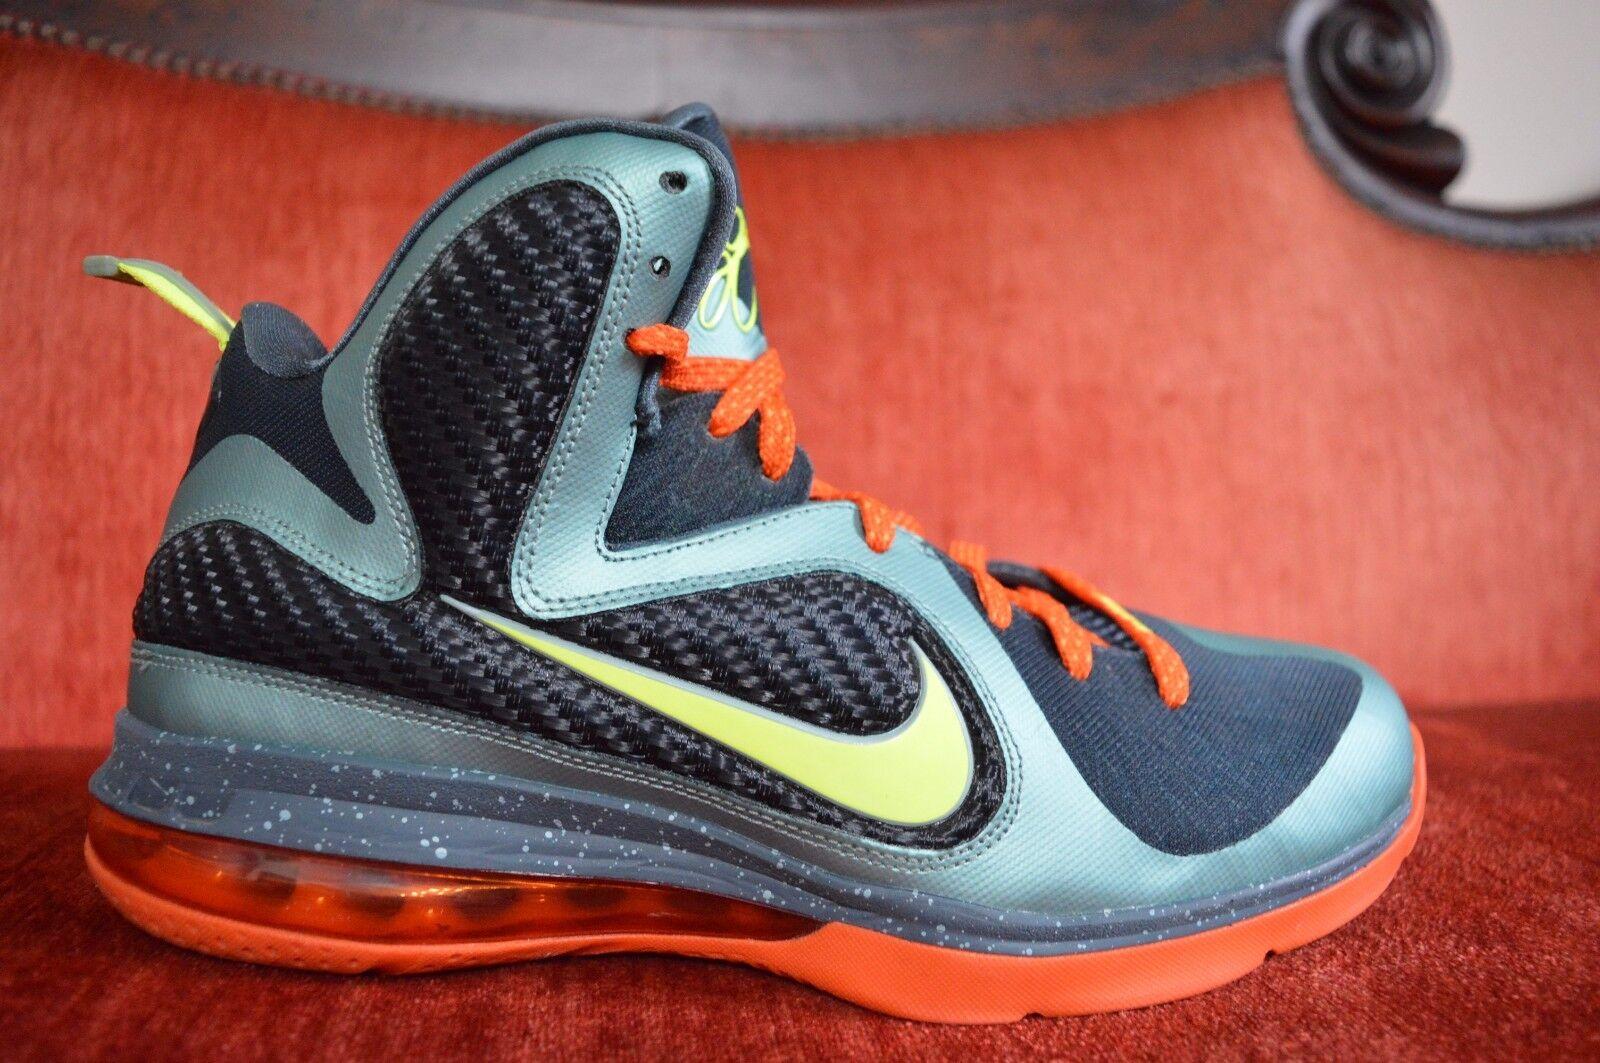 CLEAN Nike Lebron IX 9 Cannon/Volt-Slate Orange Cannon 469764-004 Size 9.5